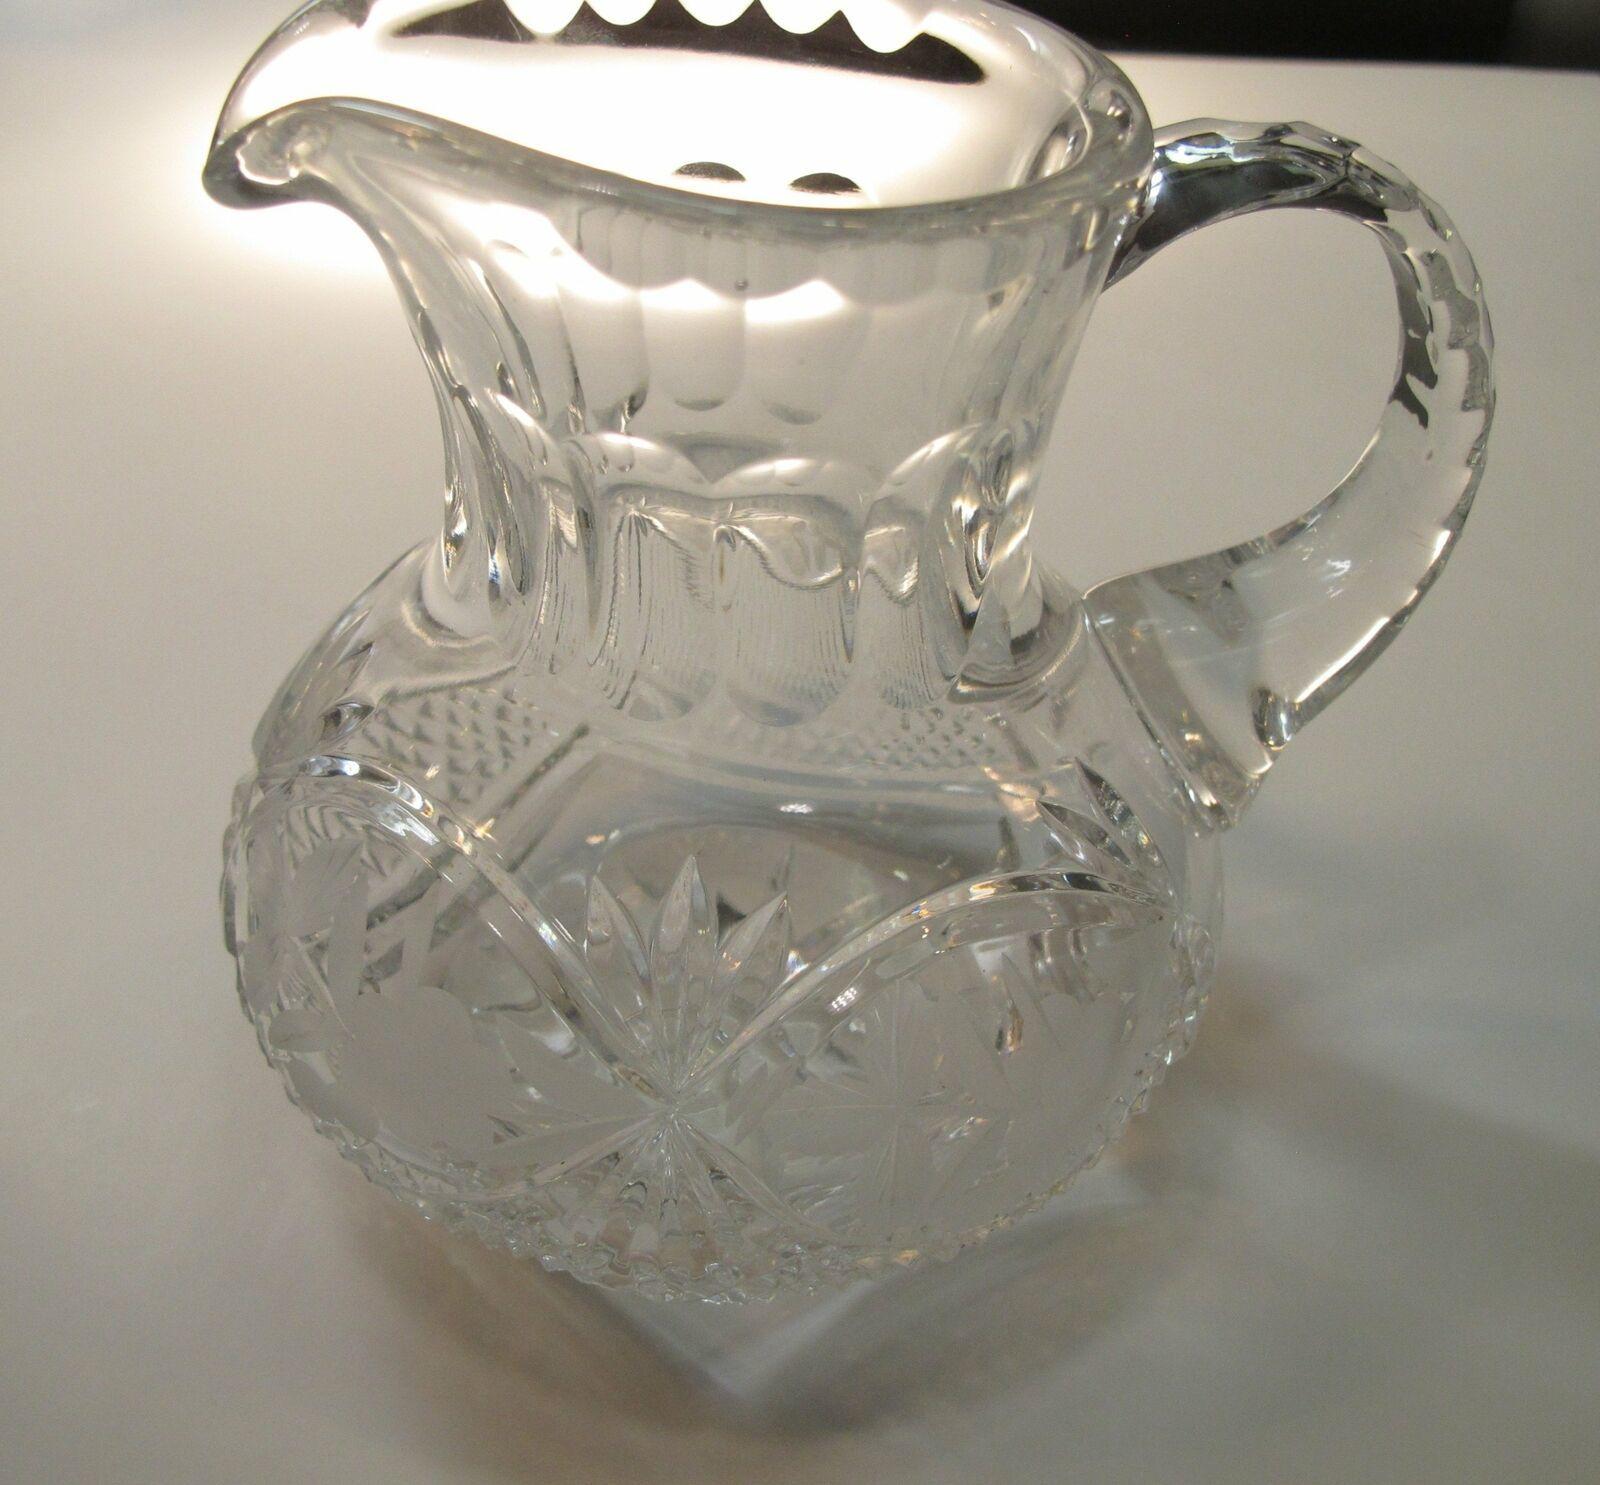 Cut glass Pitcher lead crystal - $26.77